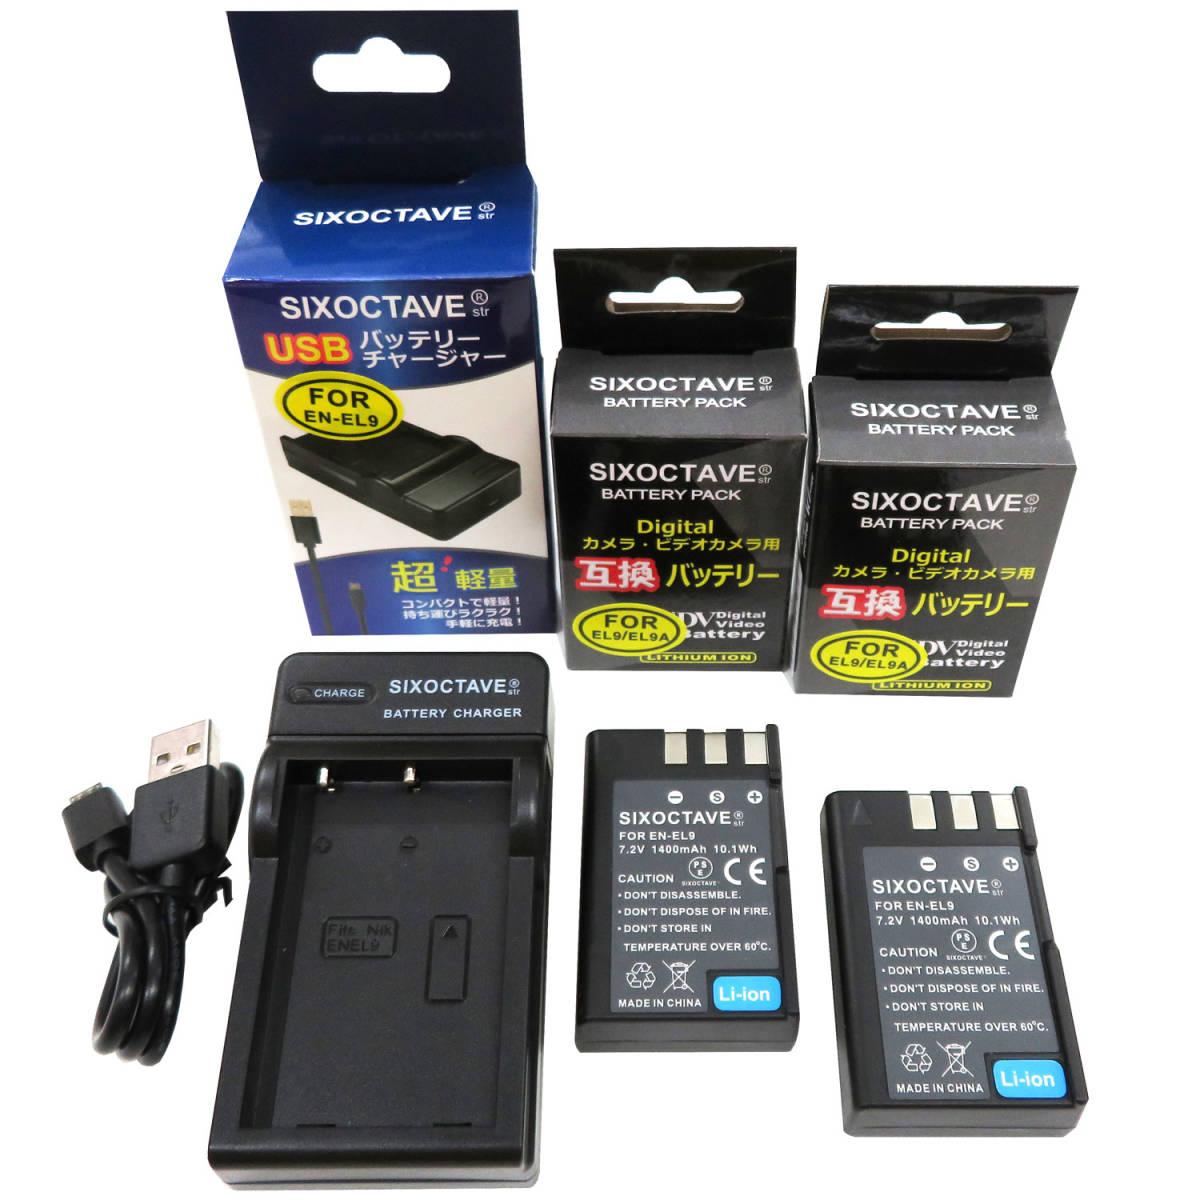 新品 NIKON ニコン EN-EL9 / EN-EL9a 互換バッテリー 2個& 急速互換充電器 USBチャージャー MH-23 D40X / D3000 / D5000 / D60 / D40_画像1